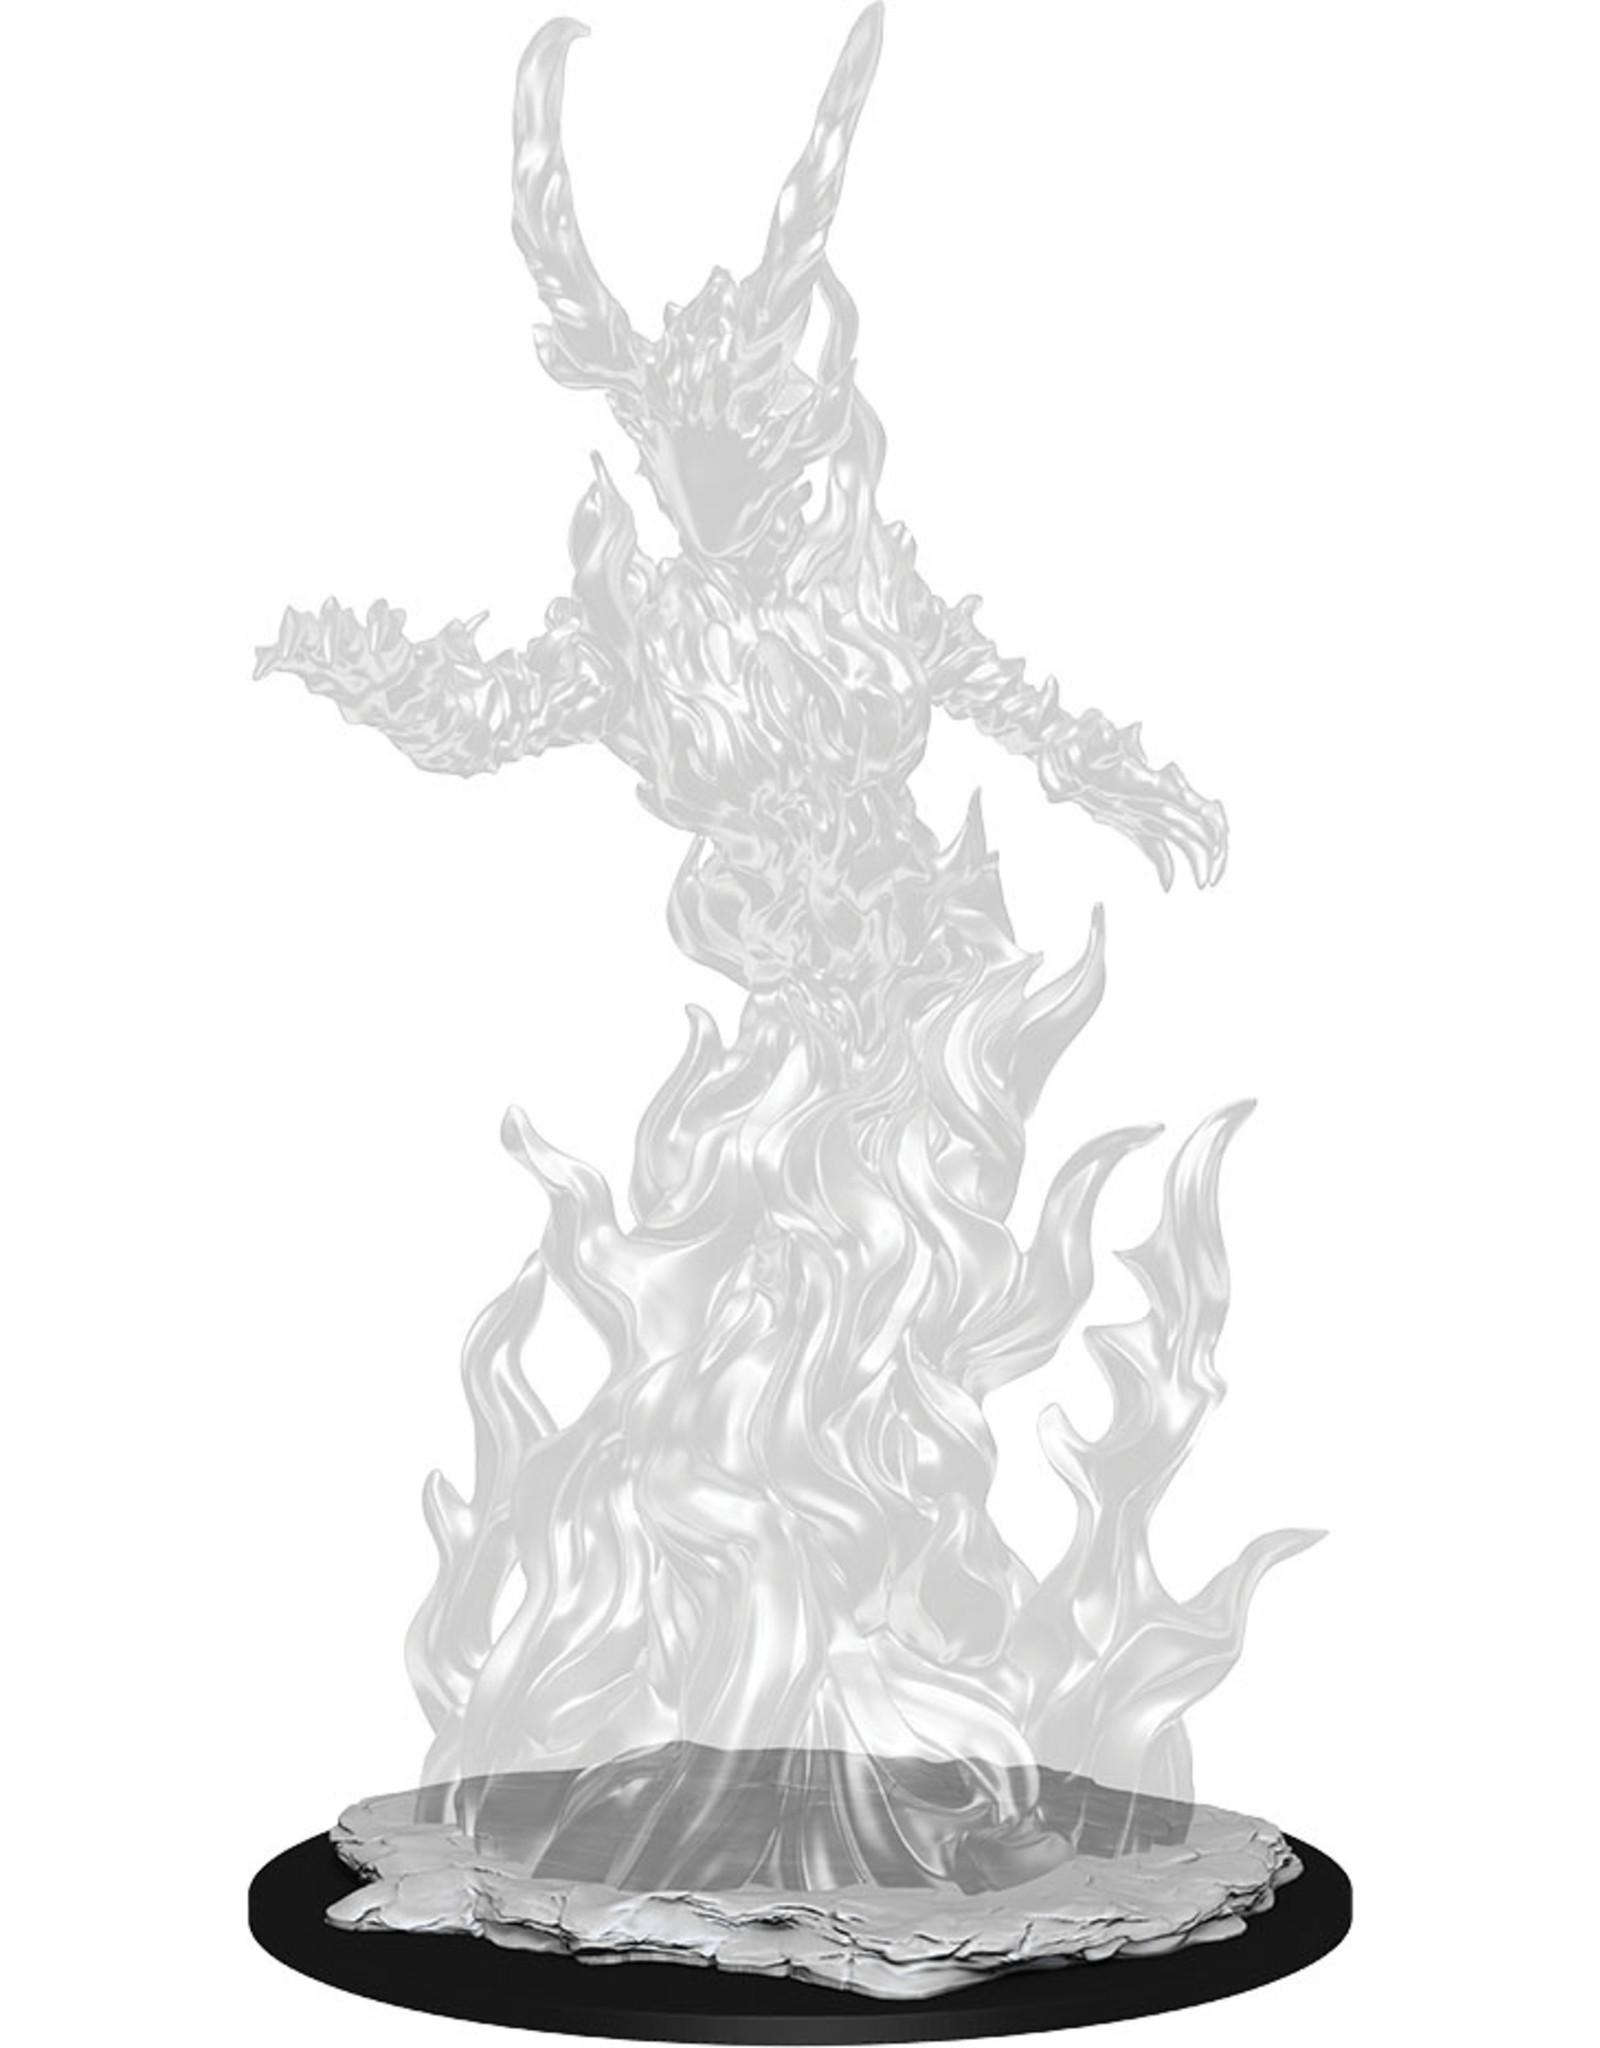 Wiz Kids D&D Nolzur's MUM: W13 Huge Fire Elemental Lord